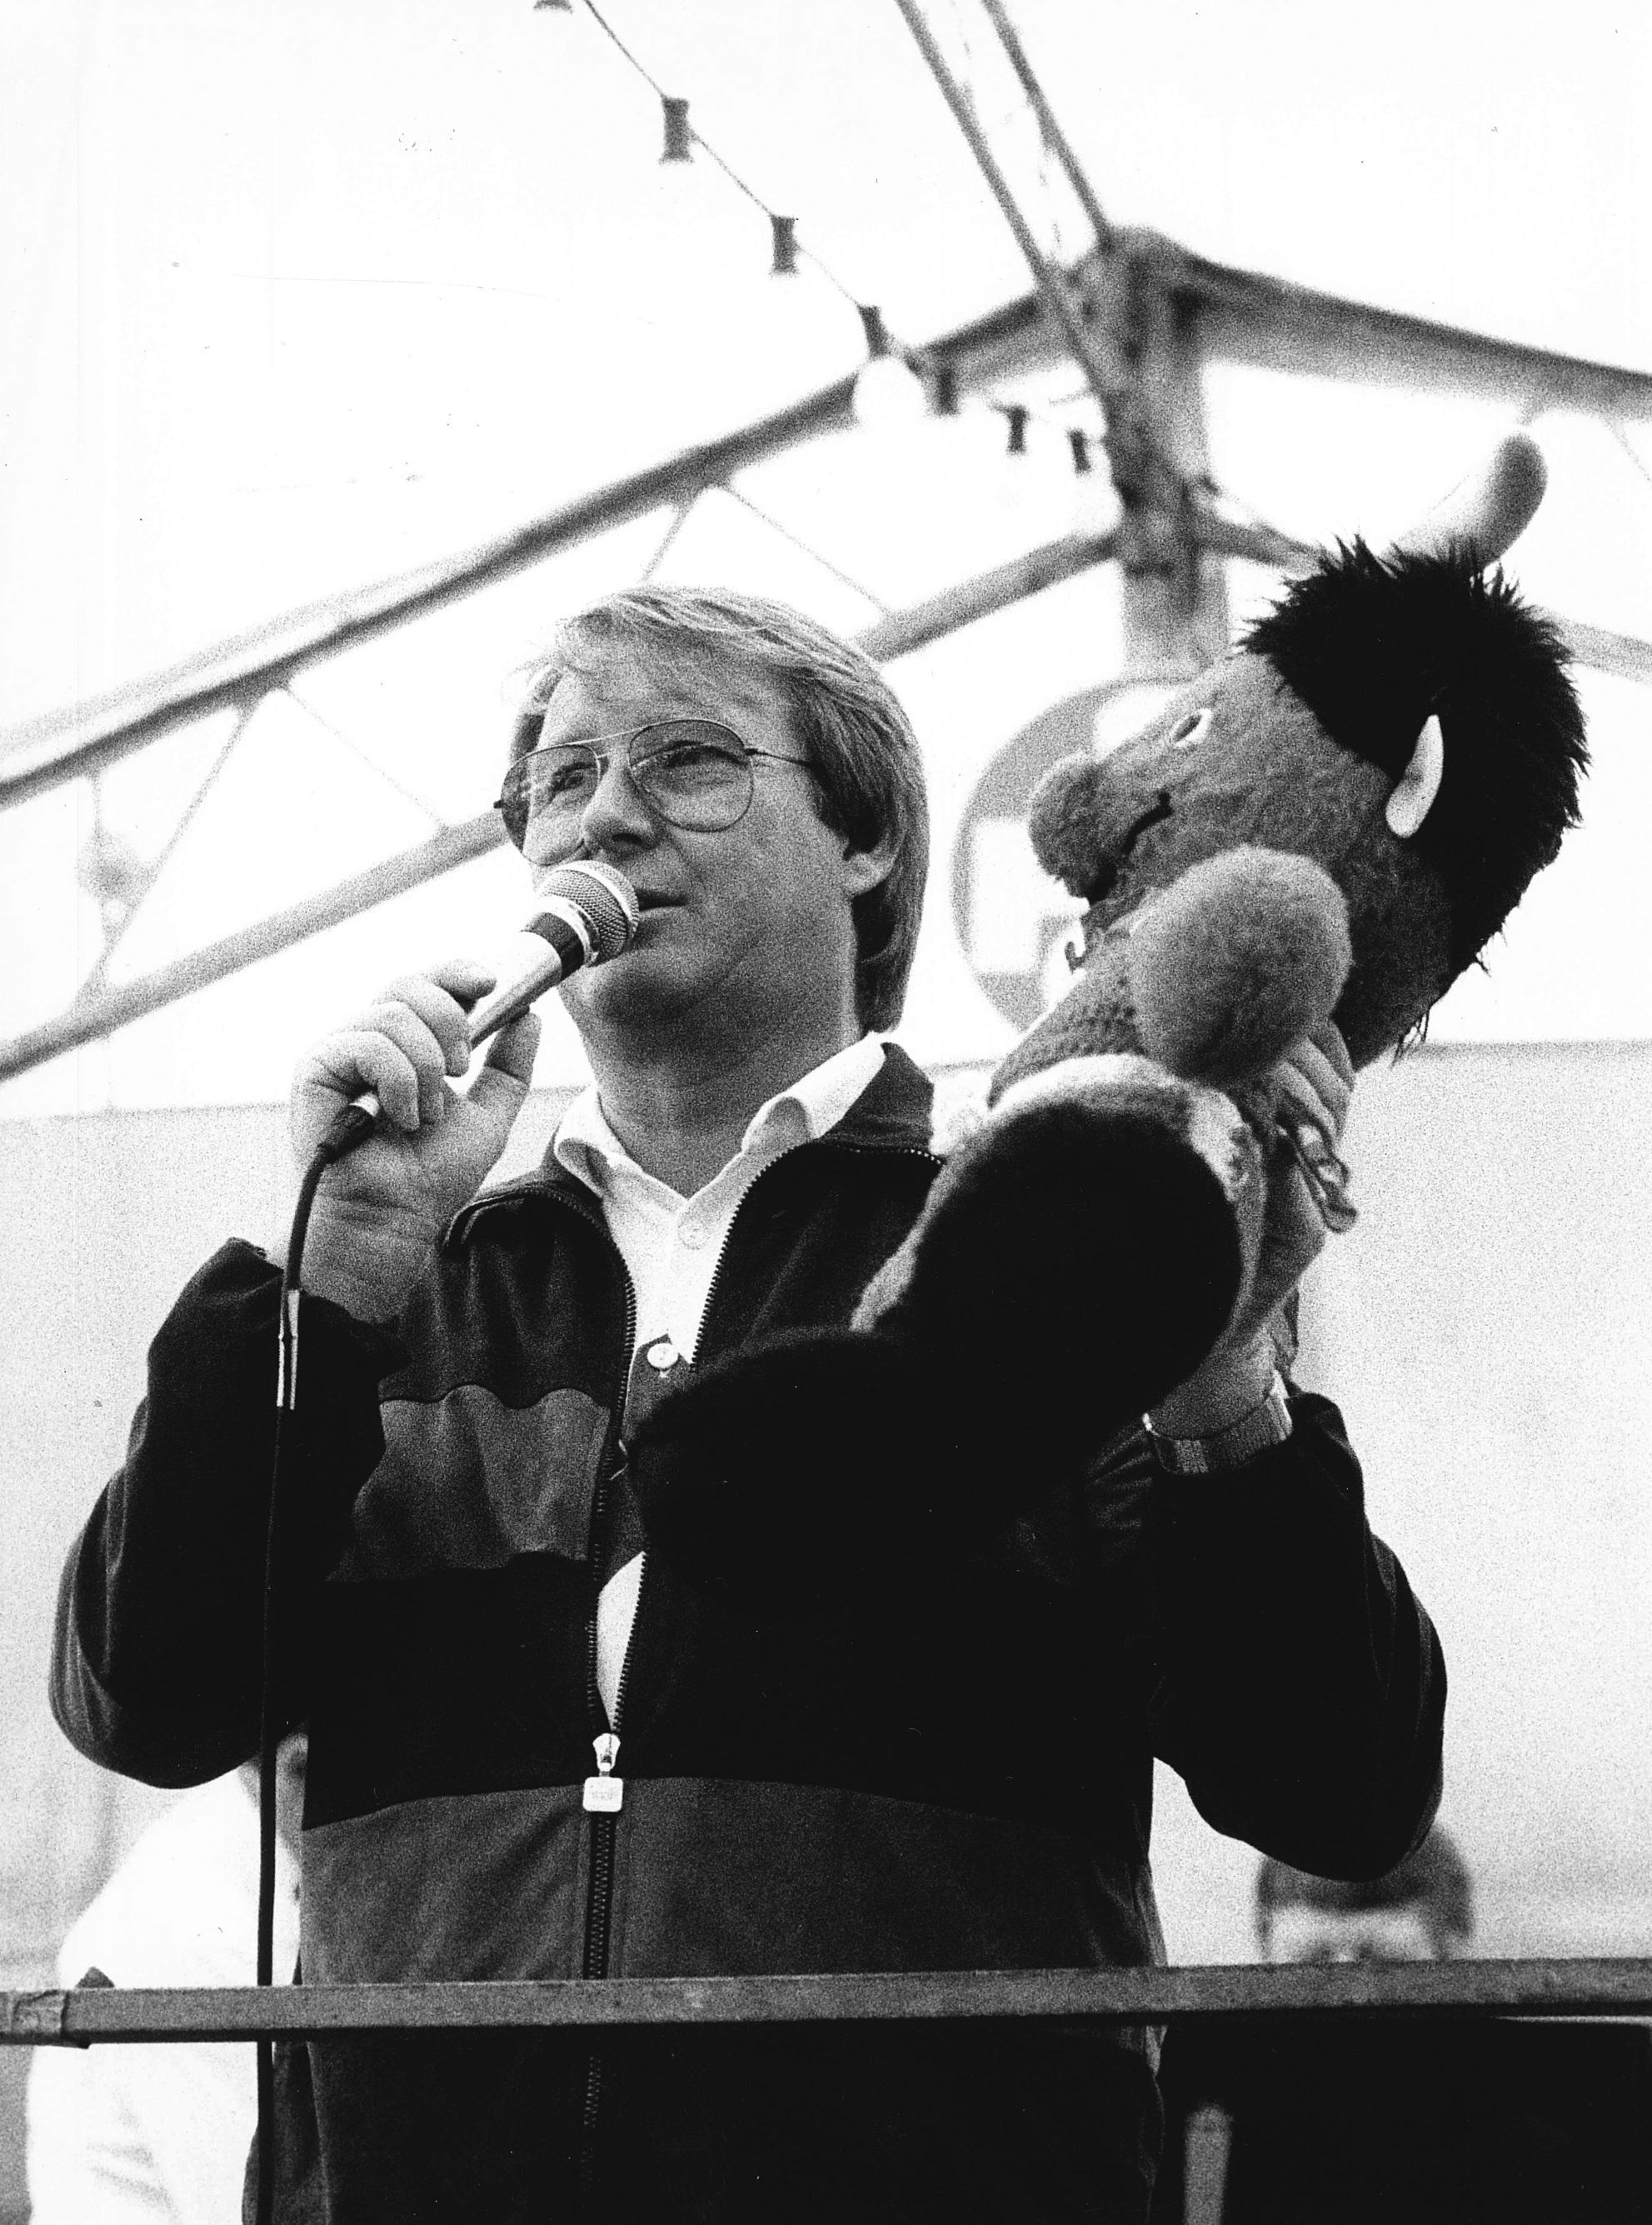 Udo Scholz in Kaiserslautern